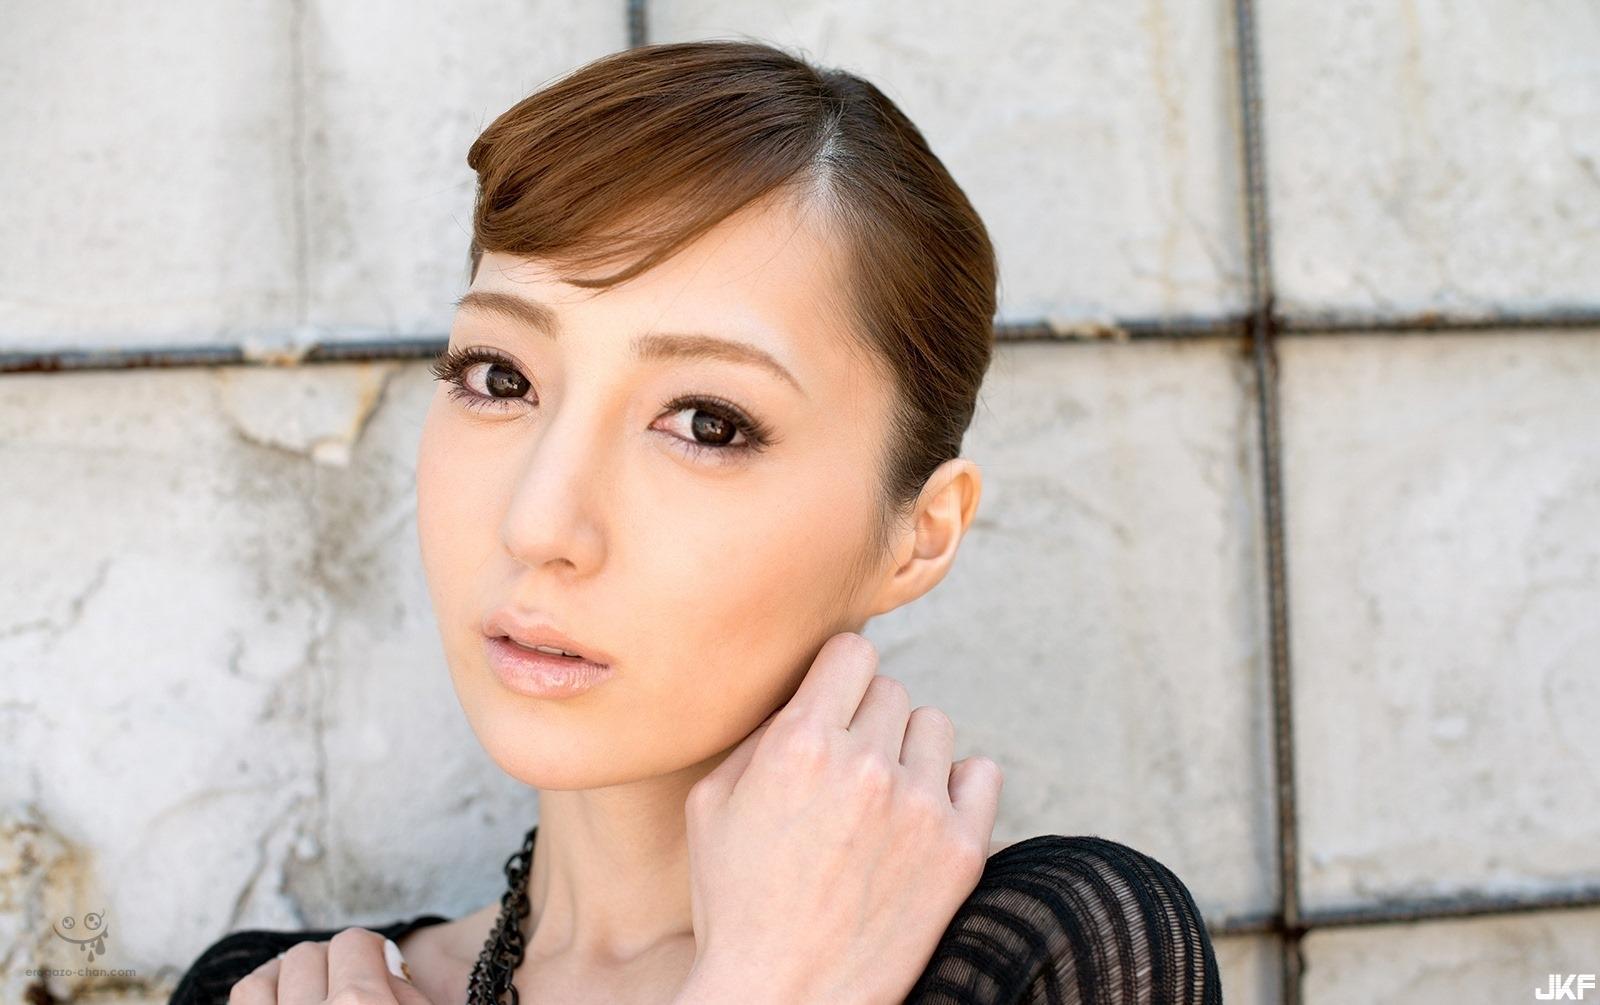 fuyutsuki_kaede_1040-045.jpg